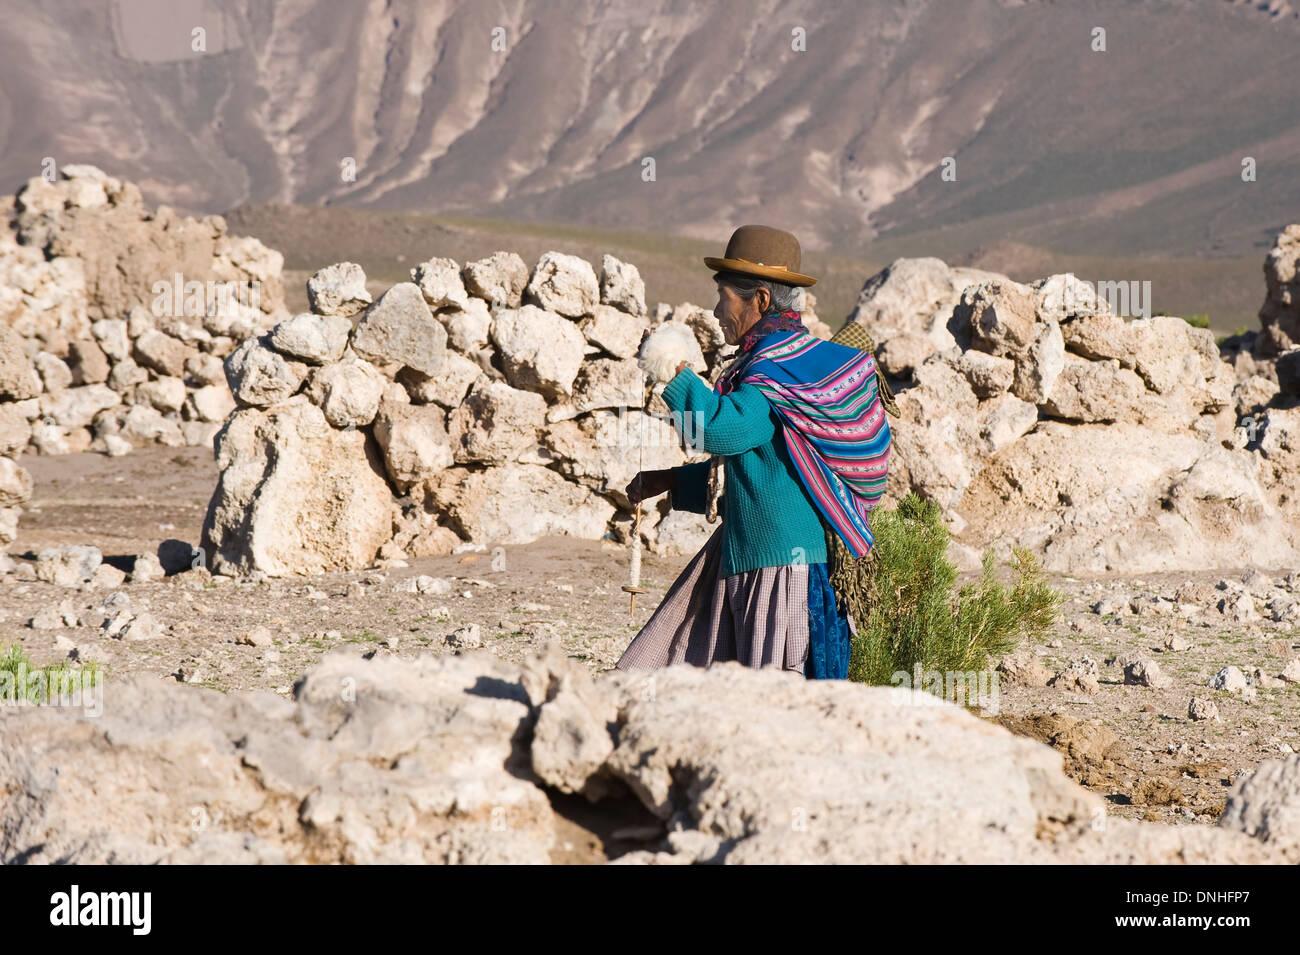 9a57f50fb102d Llama Herdswoman wearing a bowler hat also called Bombin